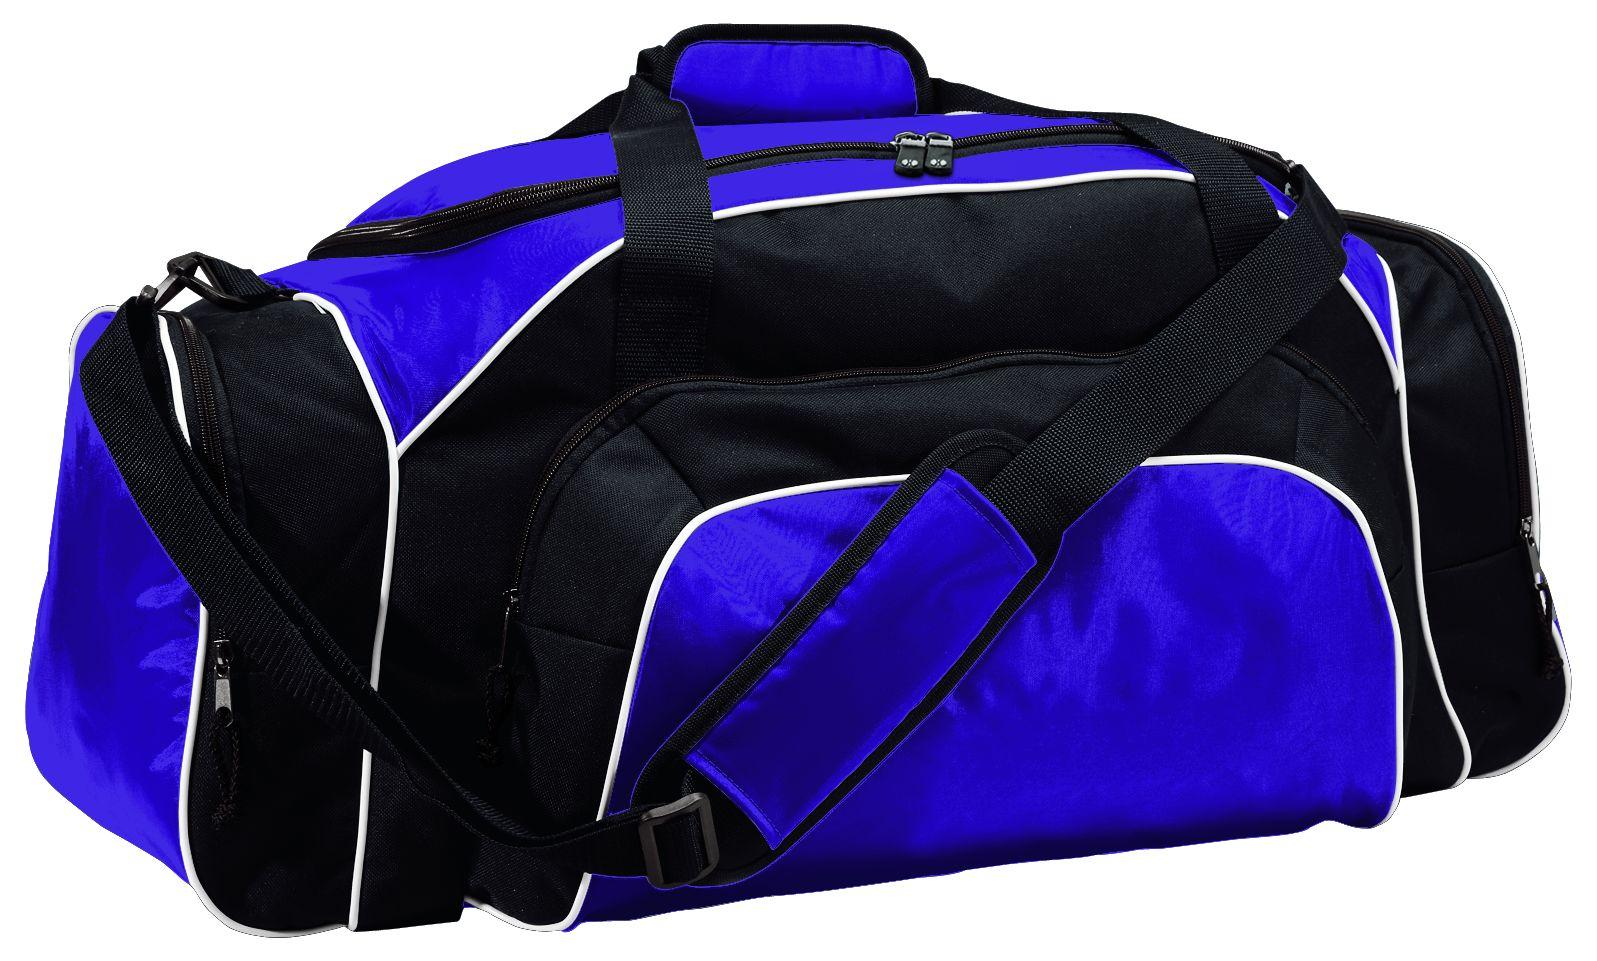 Tournament Duffel Bag - PURPLE/BLACK/WHITE